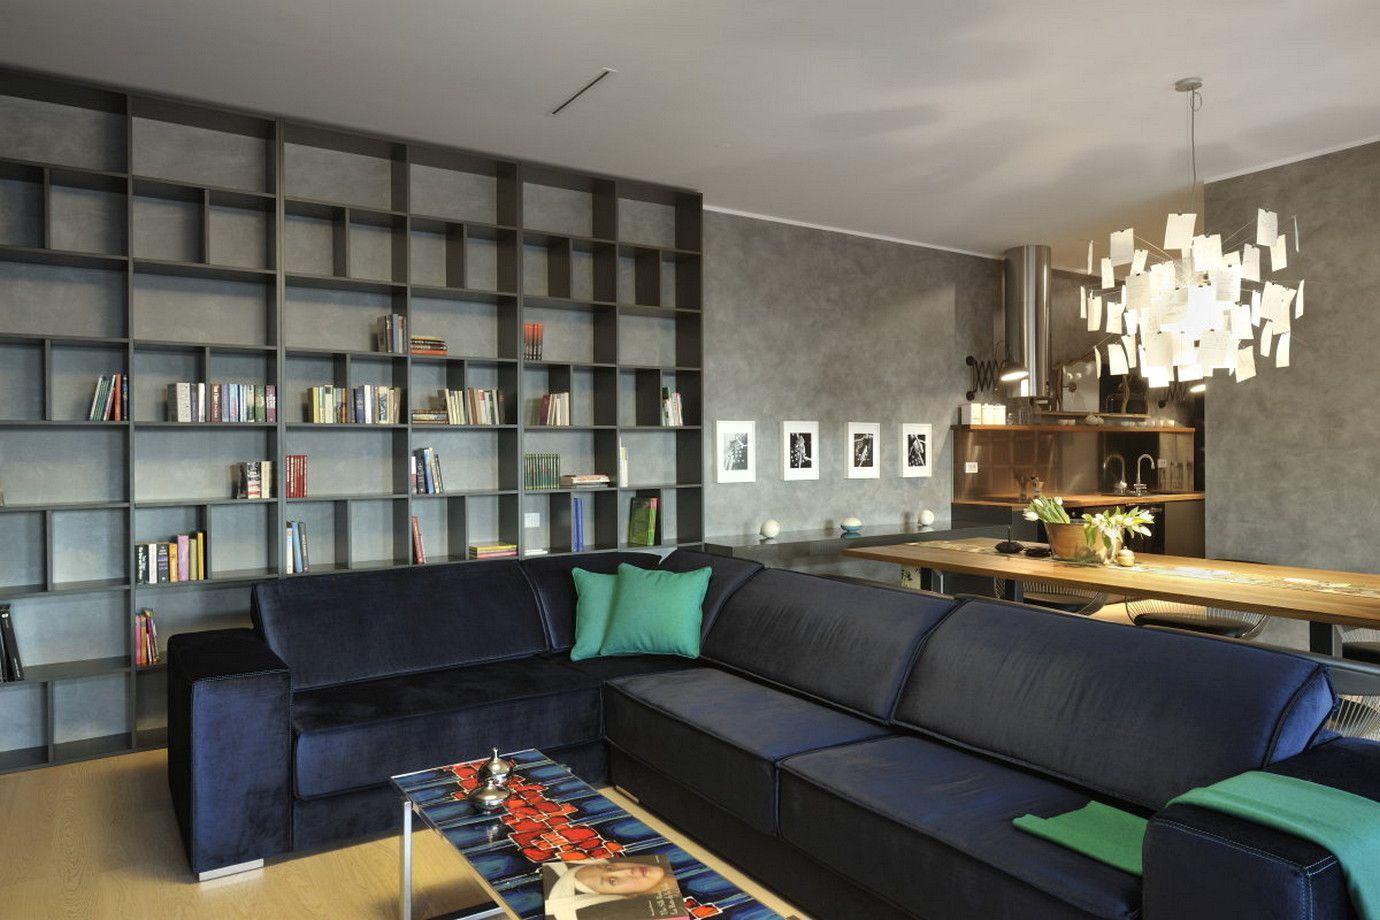 Ideas for Modern Urban Style Home Decor  Modern apartment design